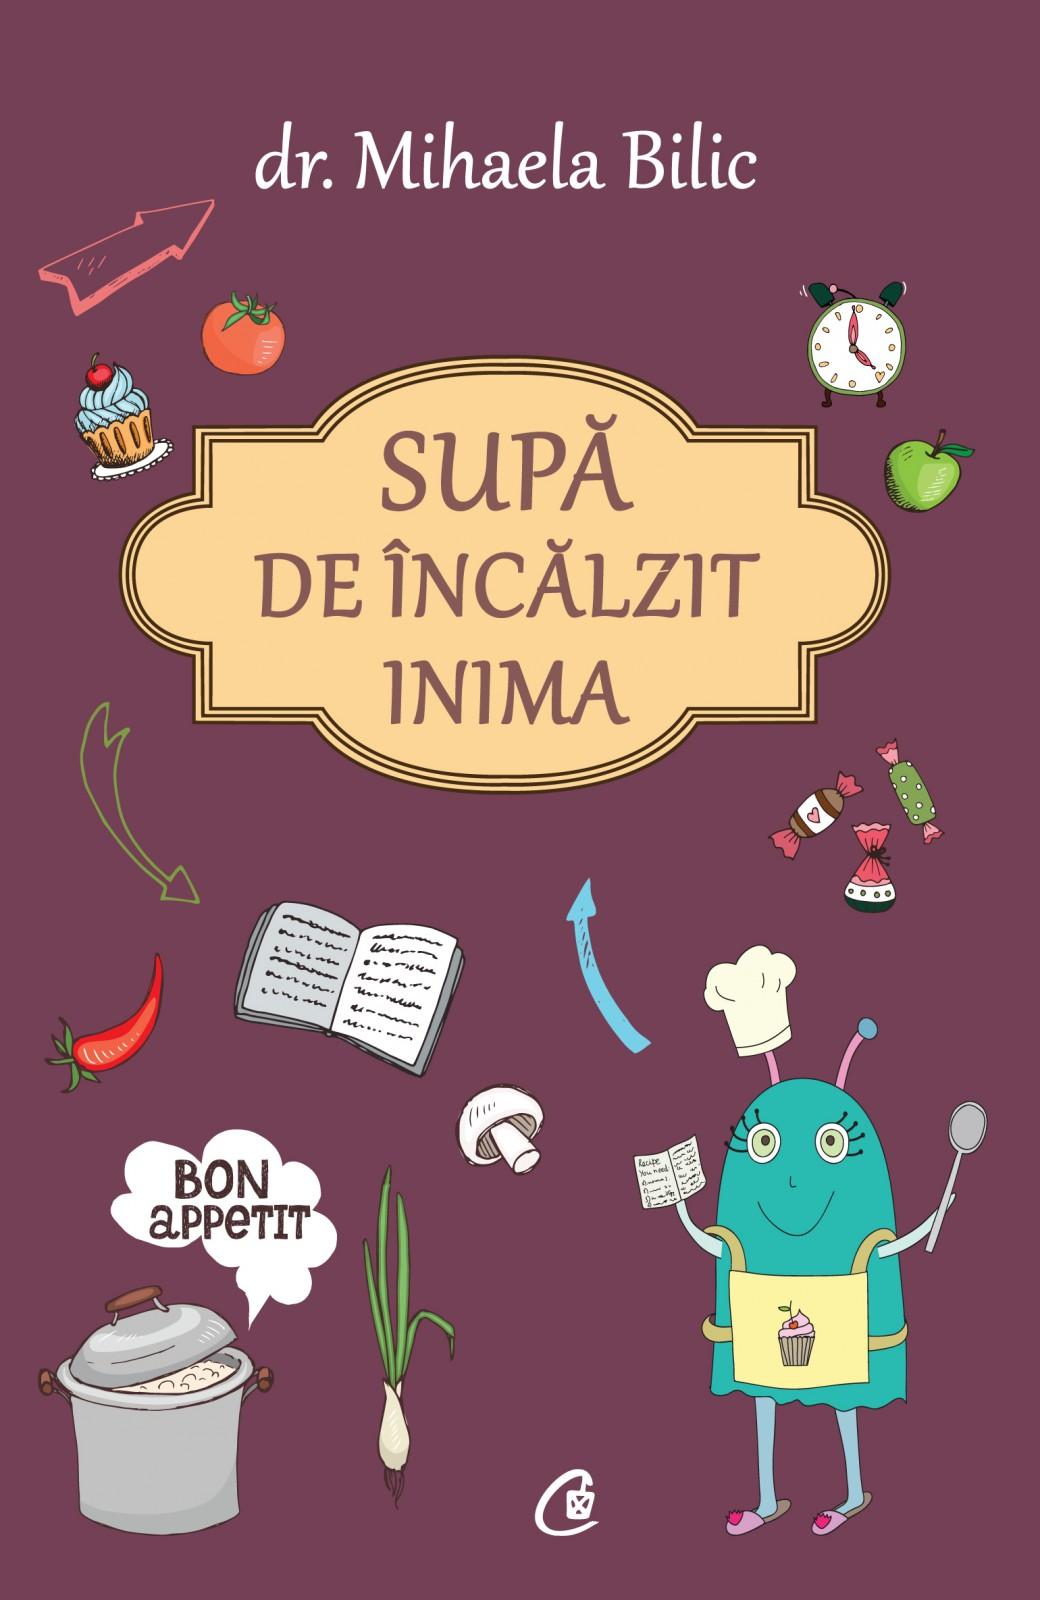 supa-de-incalzit-inima_coperta1m